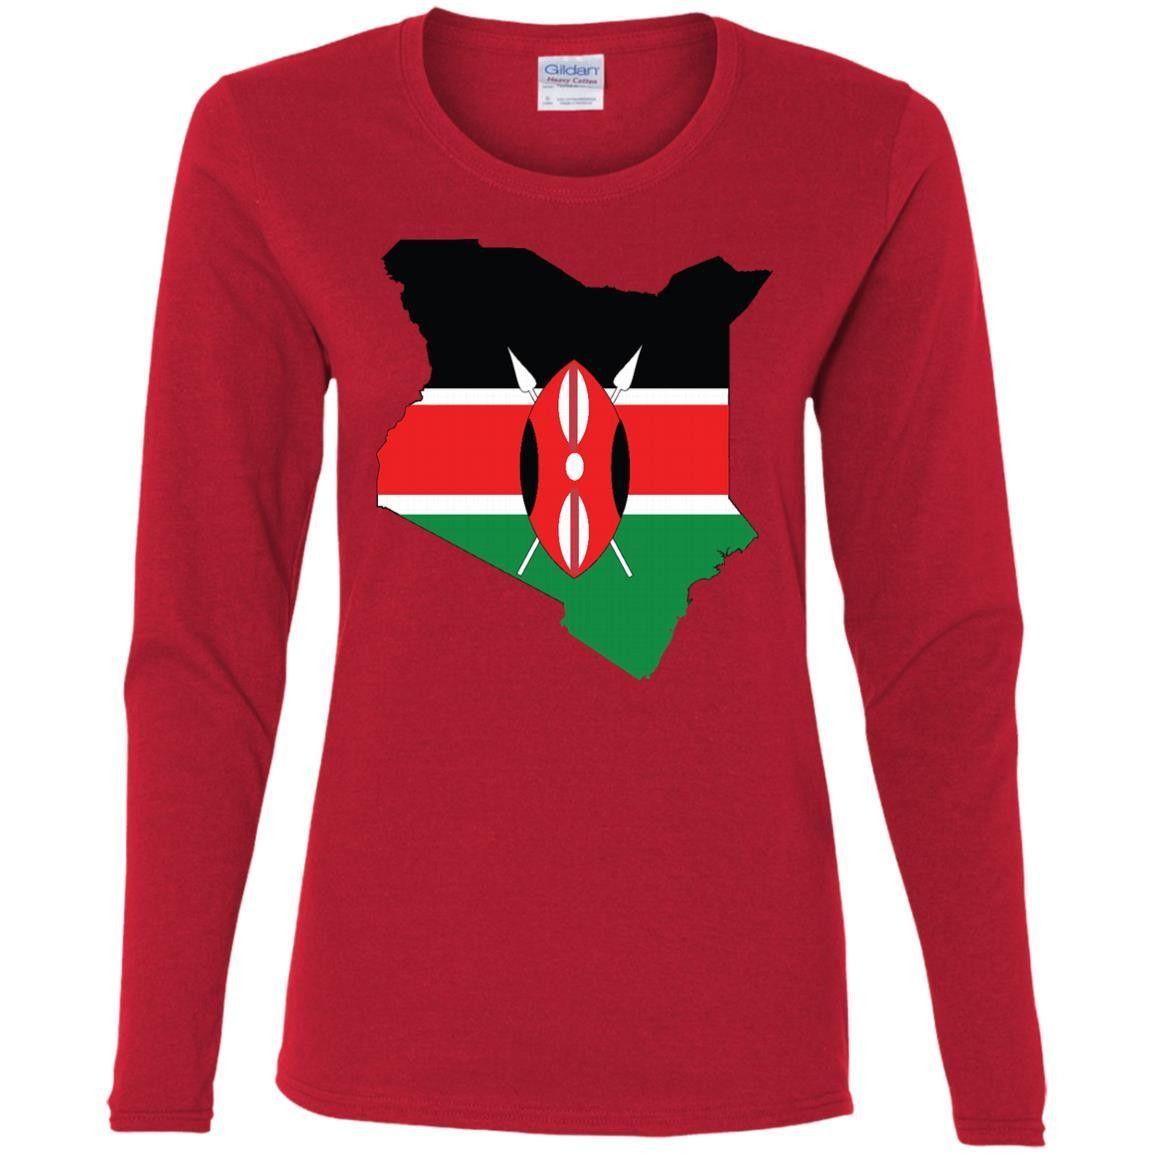 Kenya flag-01 G540L Gildan Ladies' Cotton LS T-Shirt